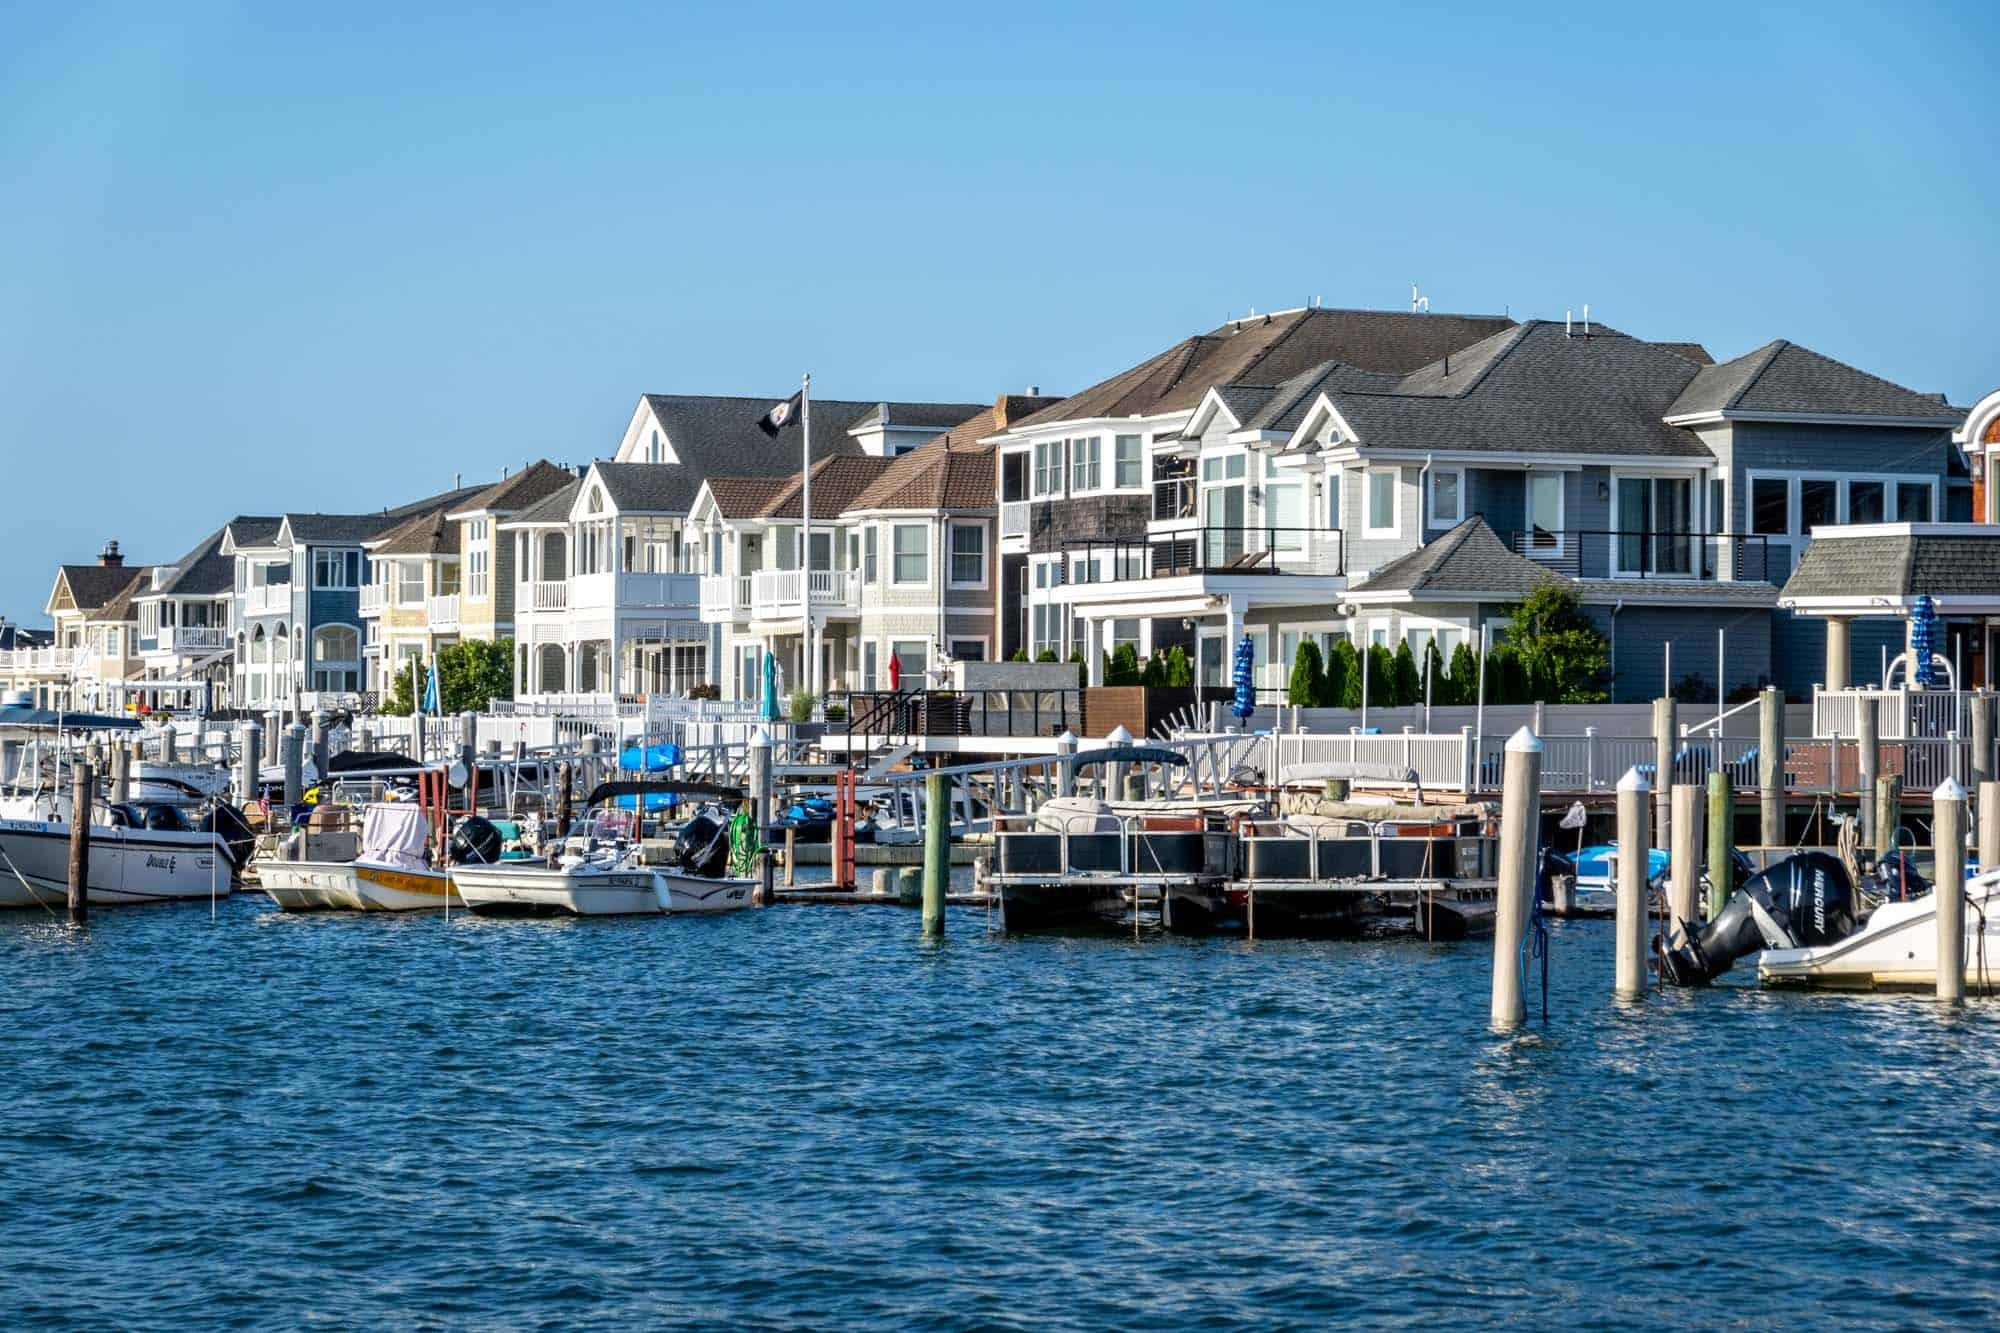 Homes along a bay with marina